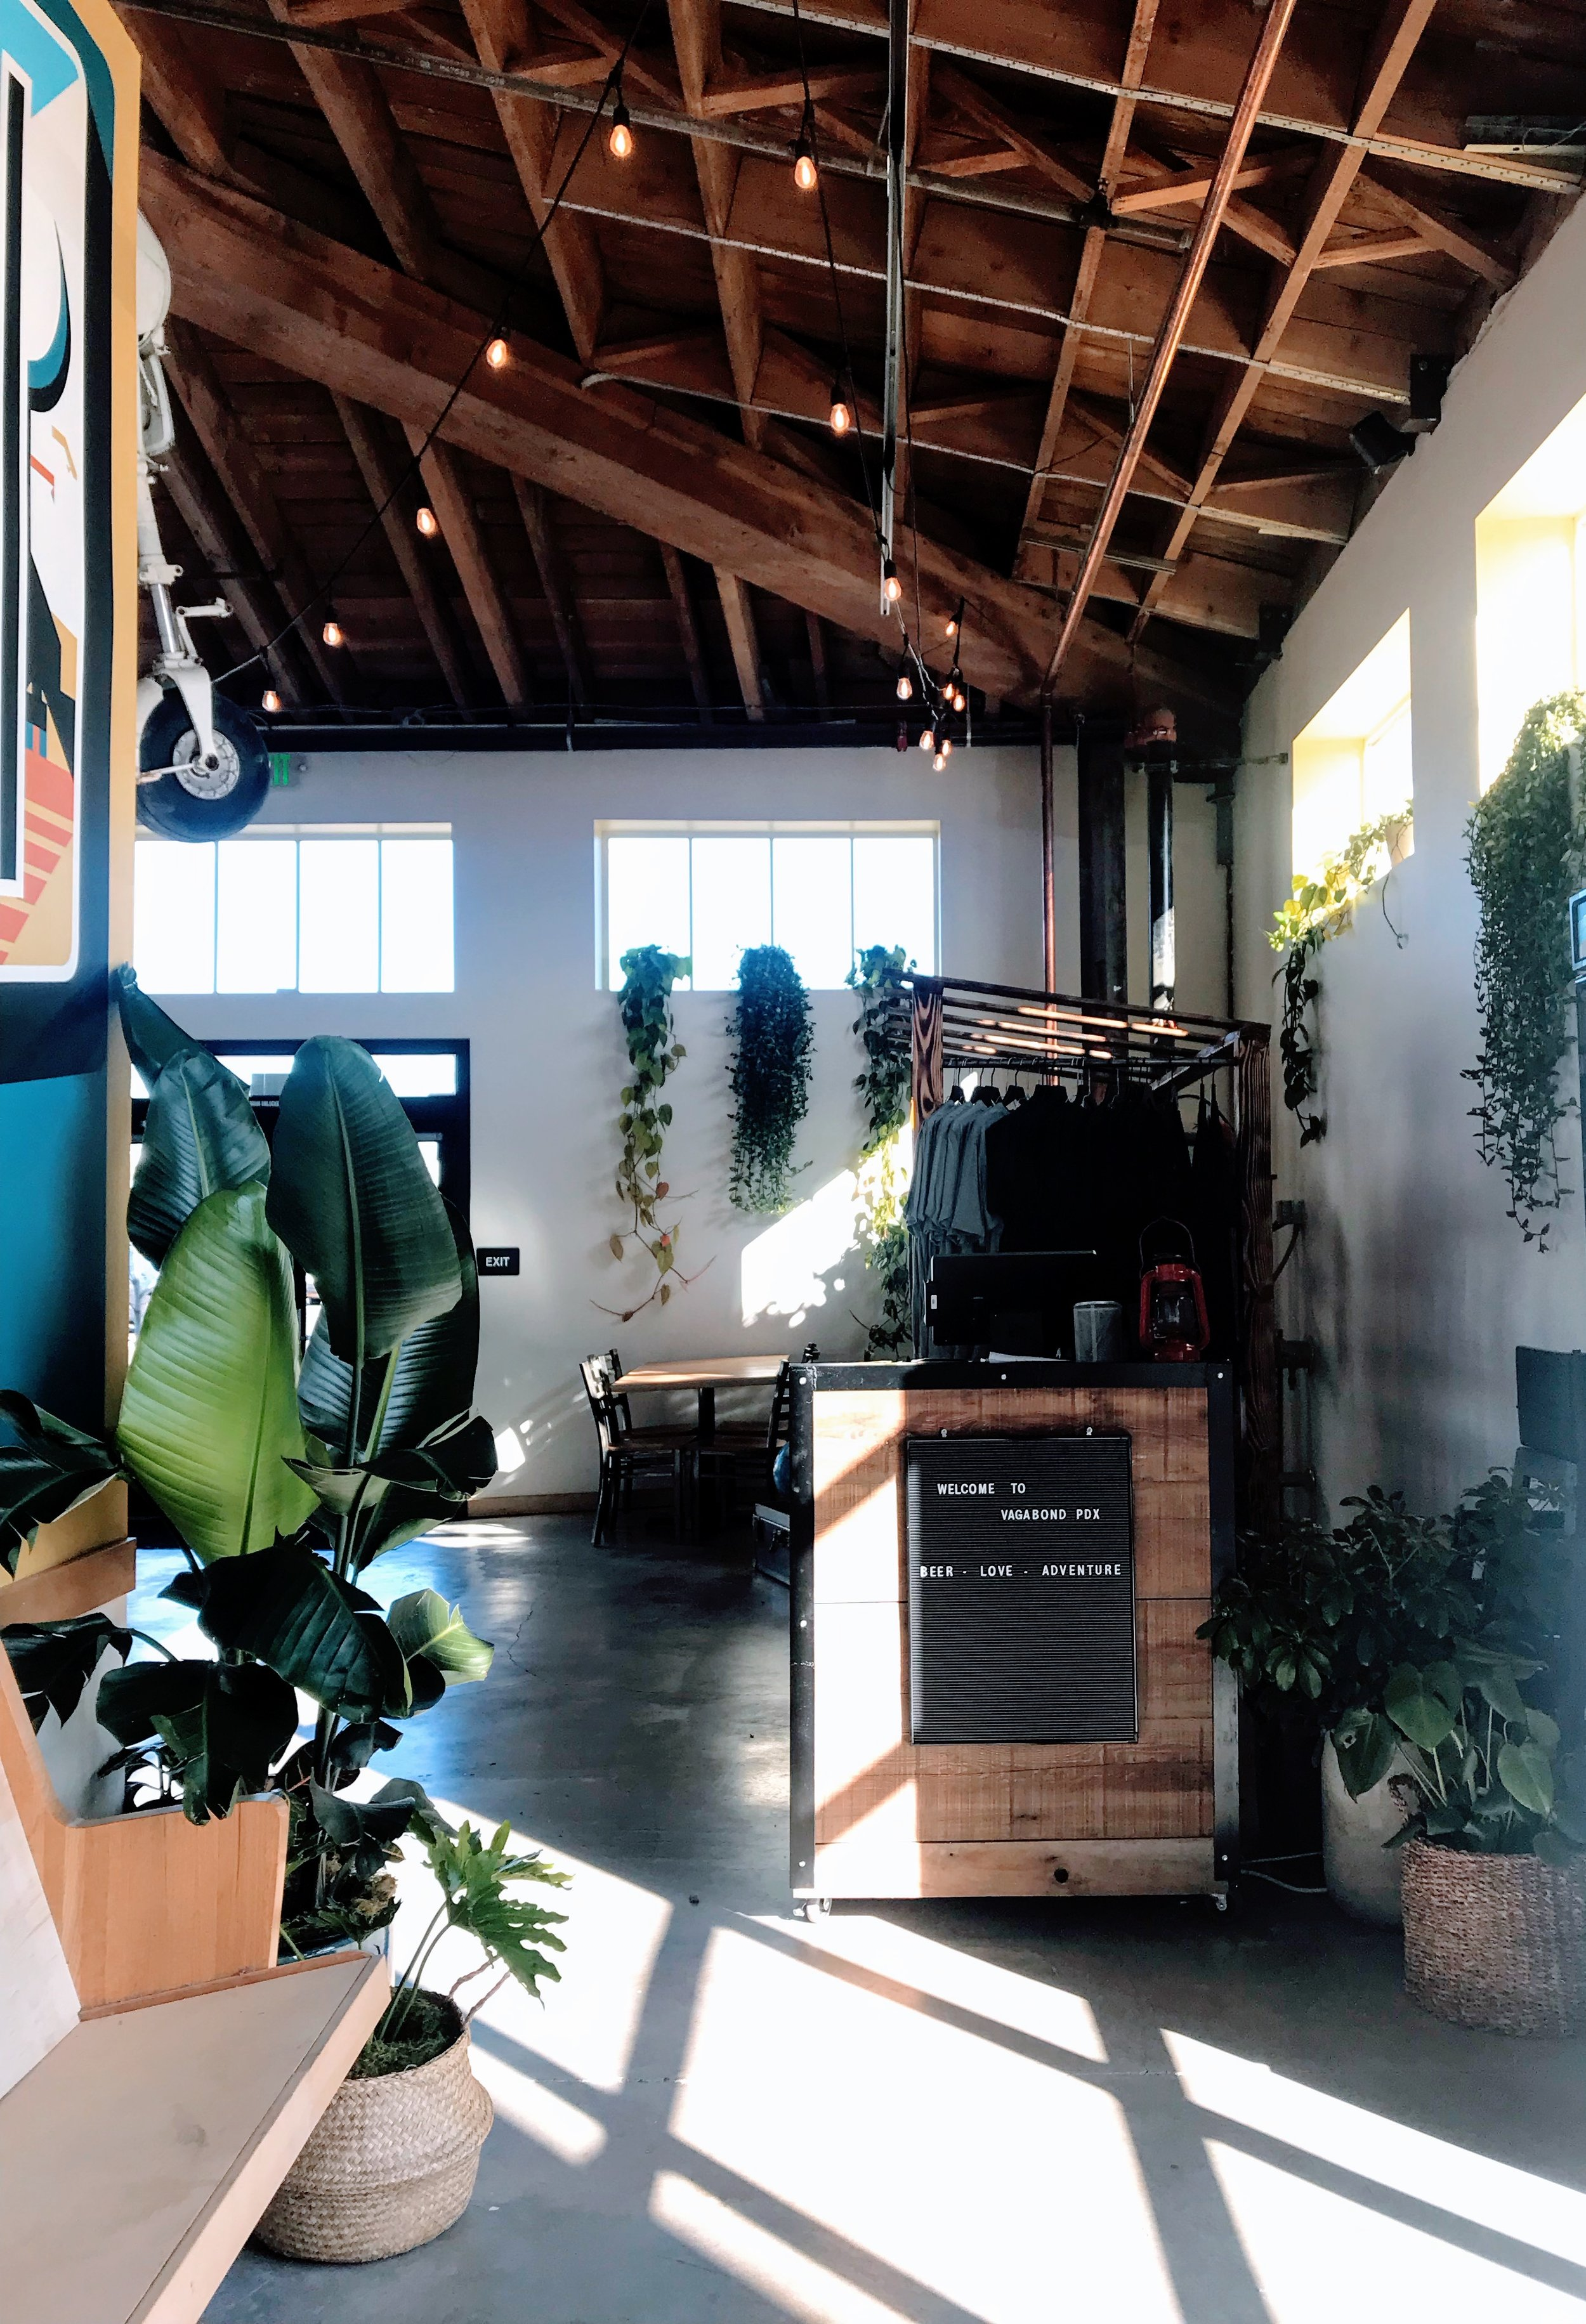 Commercial Installation / Vagabond Brewing, Portland, Ore.